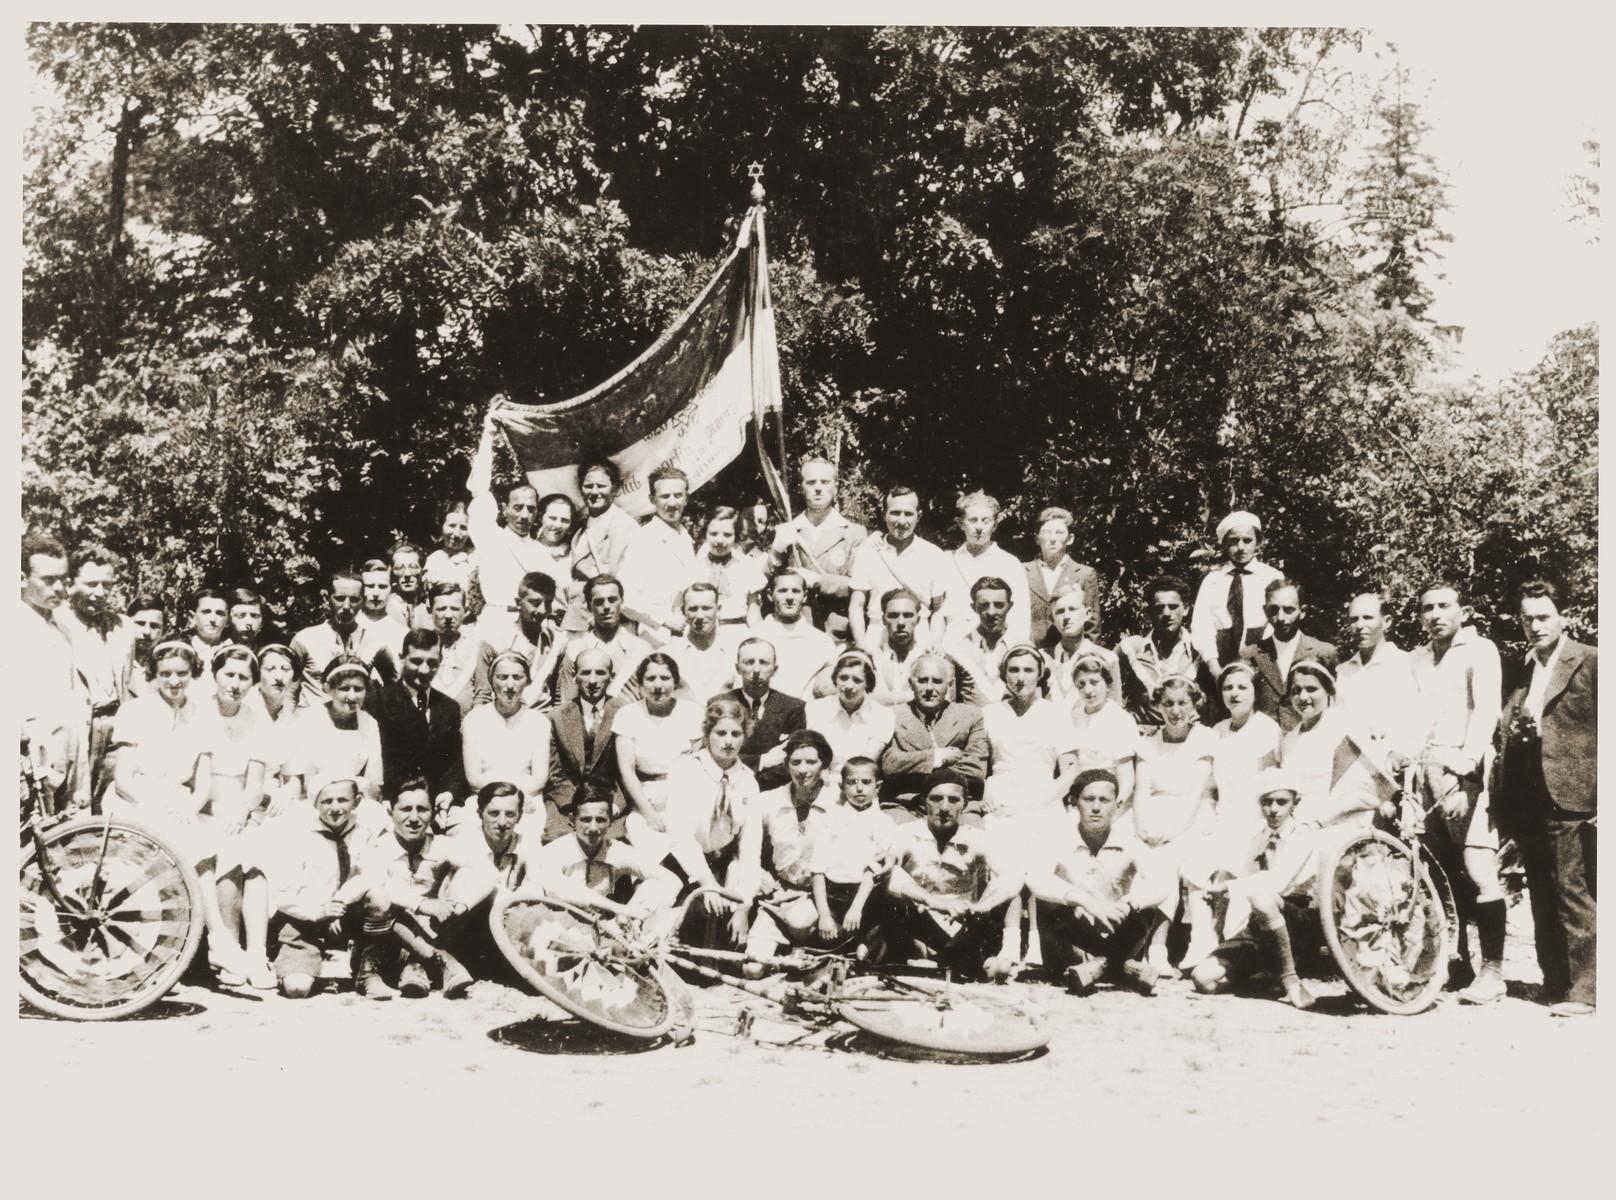 Group portrait of members of the Maccabi group of Sadgura  Included in the photo are Jacob Katz, Igo Teitler, Donia Schaeffer, Edith Kula and Katz.